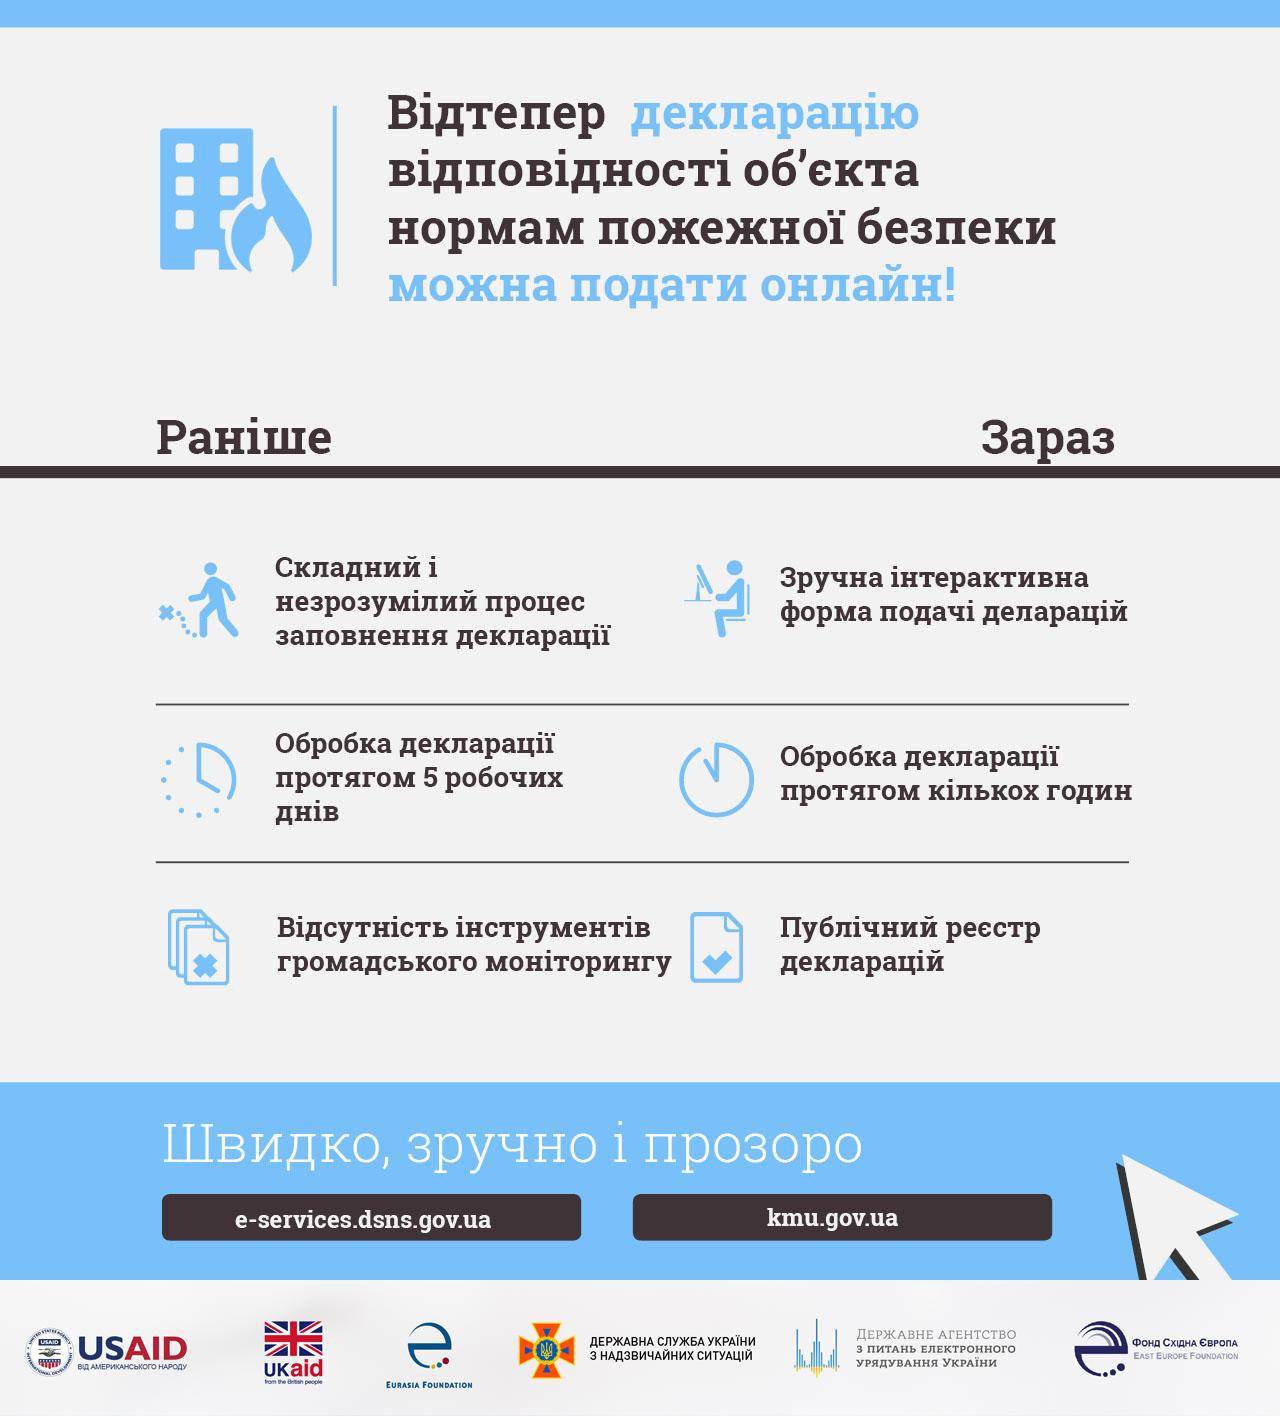 https://www.kmu.gov.ua/storage/app/uploads/public/5a8/452/a1c/5a8452a1c6454063172279.png